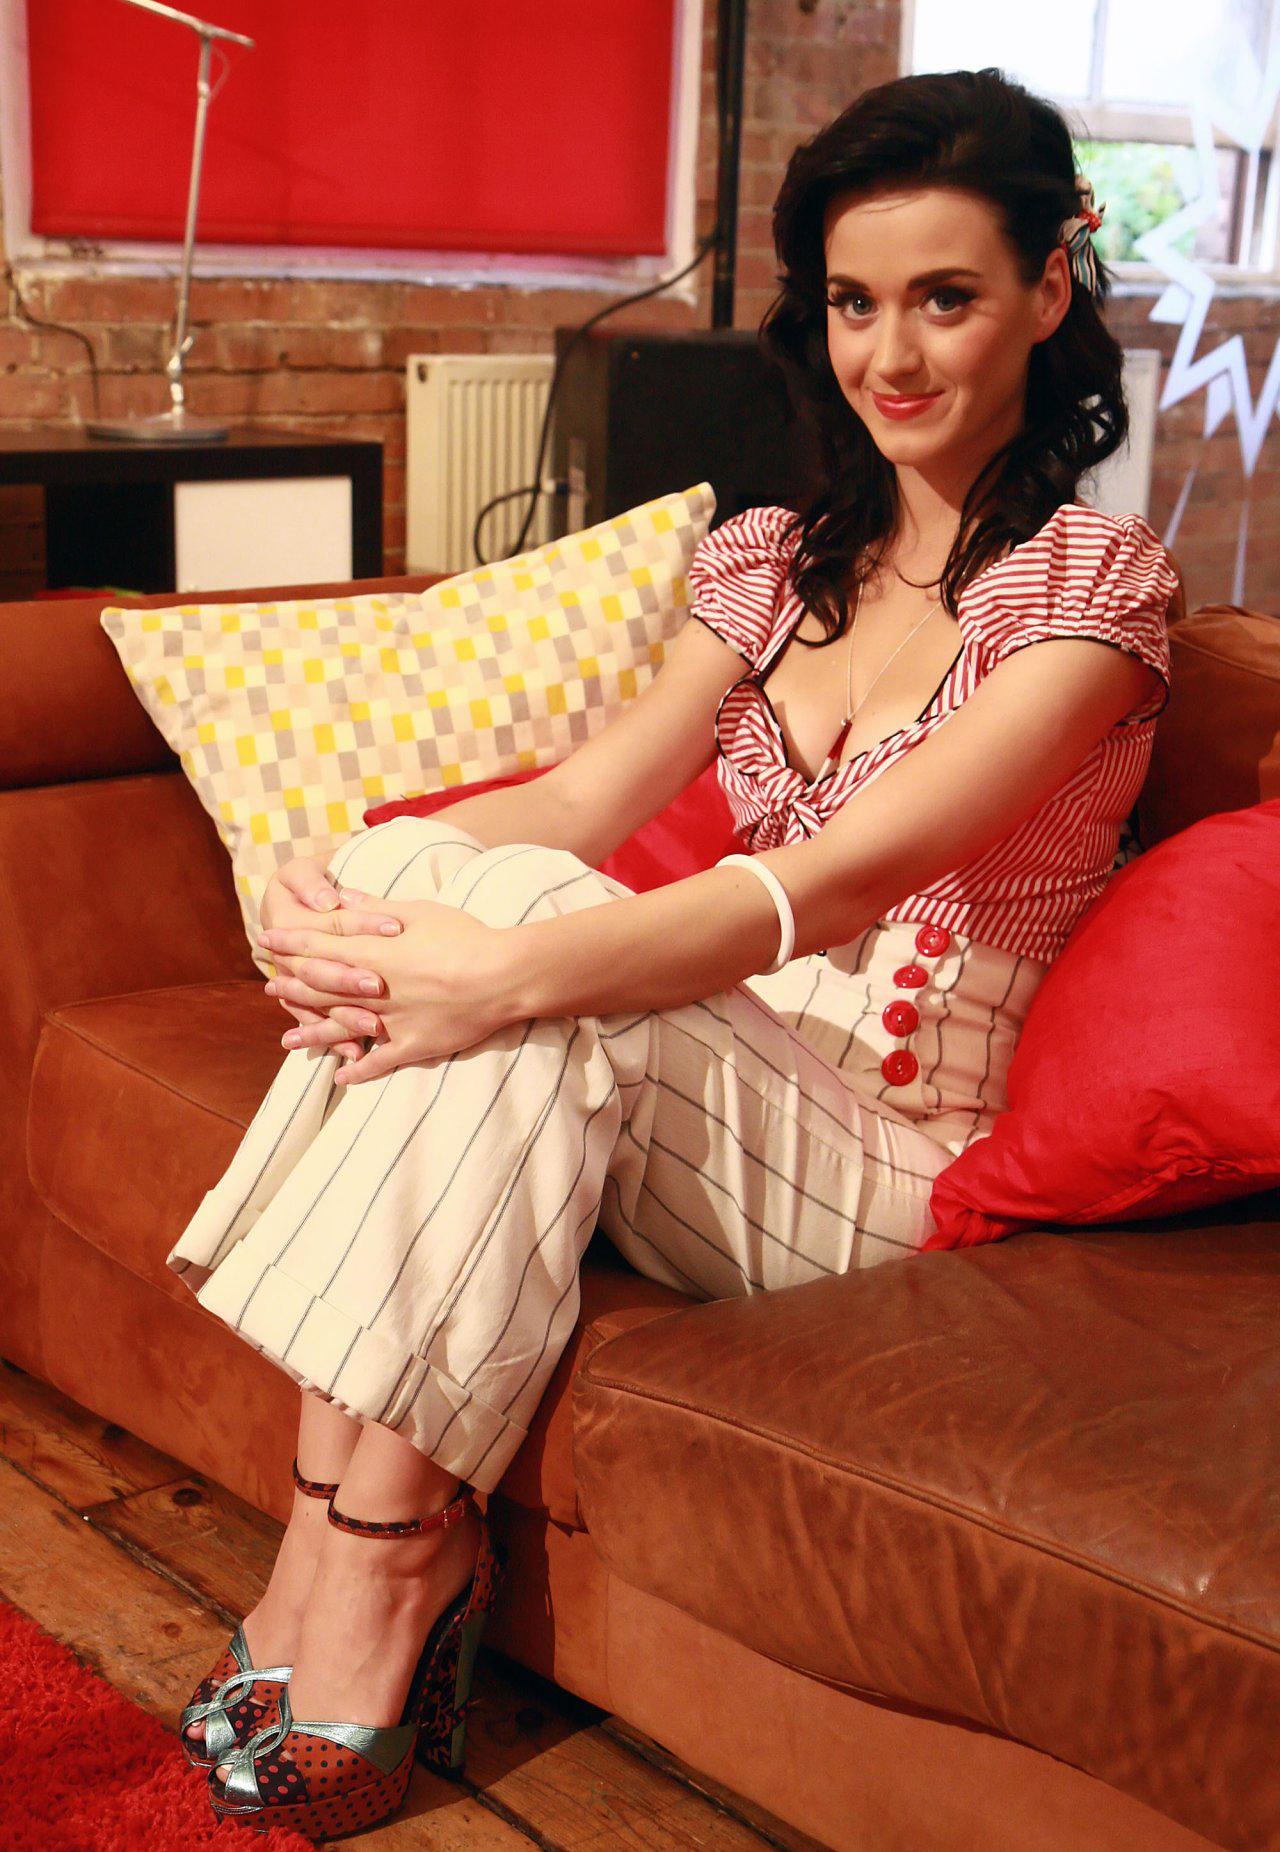 Katy Perry At Home Sheclick Com